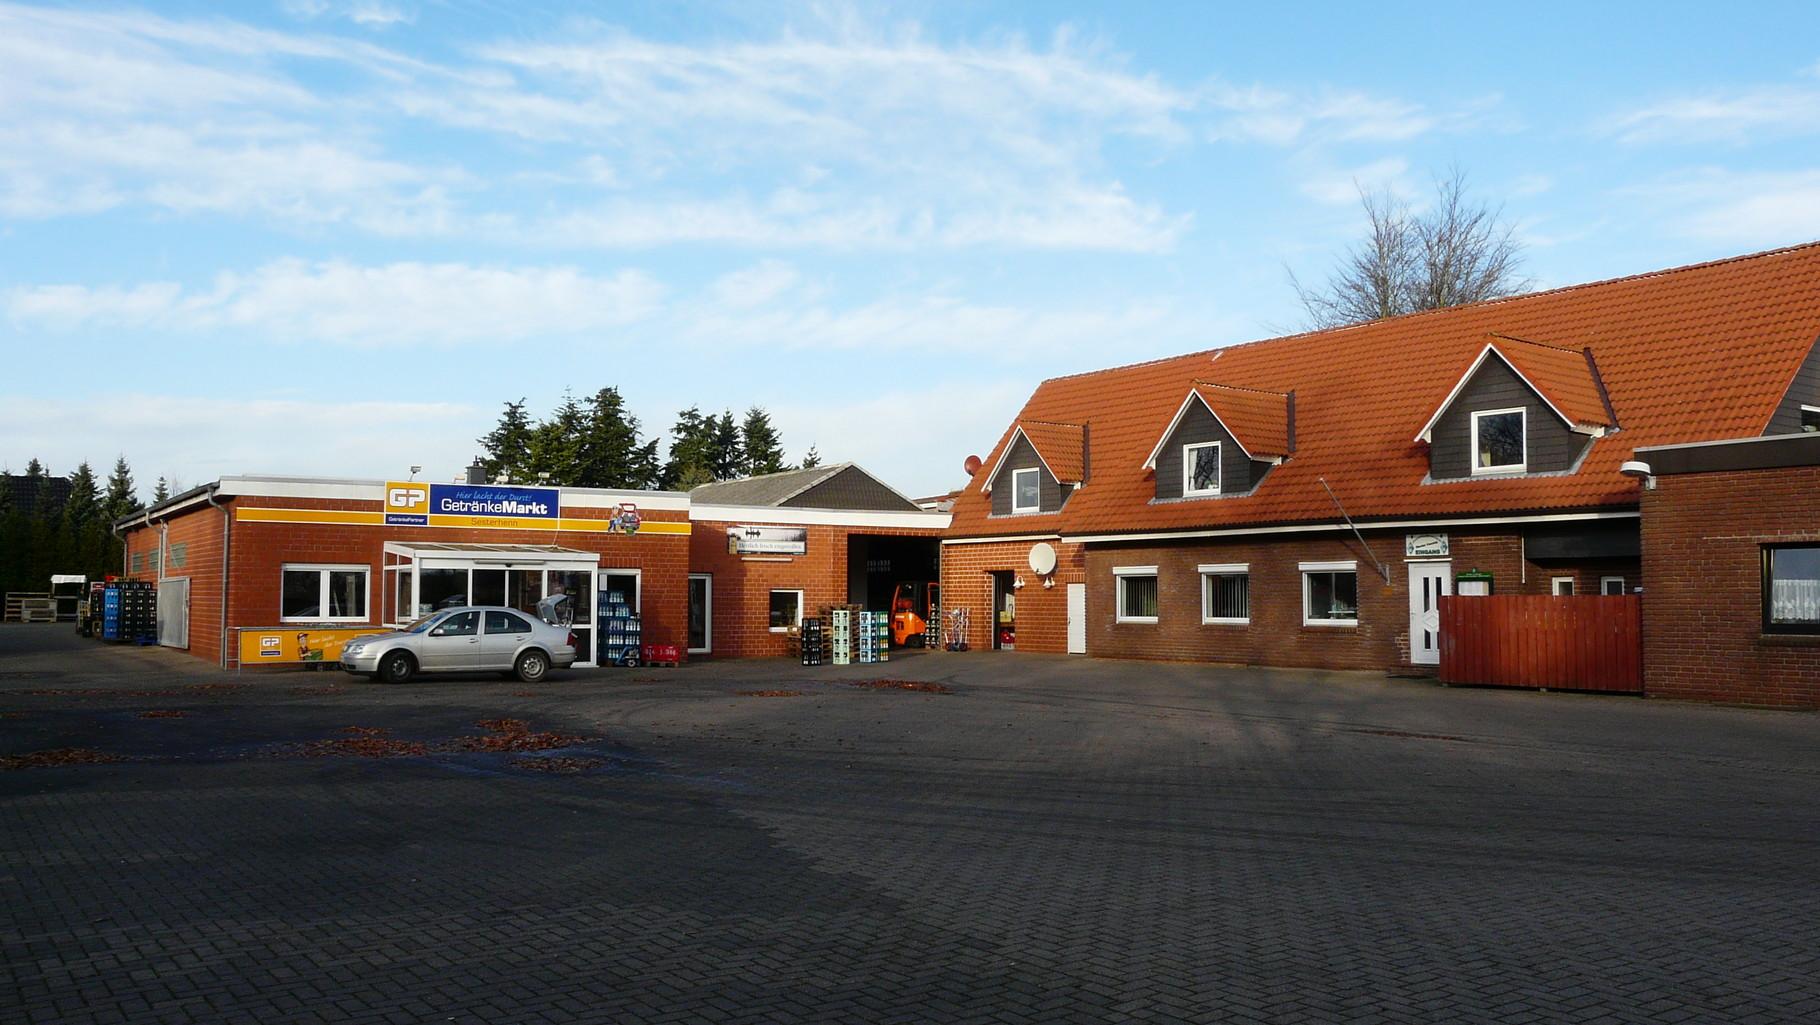 Getränke Sesterhenn, Gastronomie-Service aus Nordholz - Sesterhenn ...